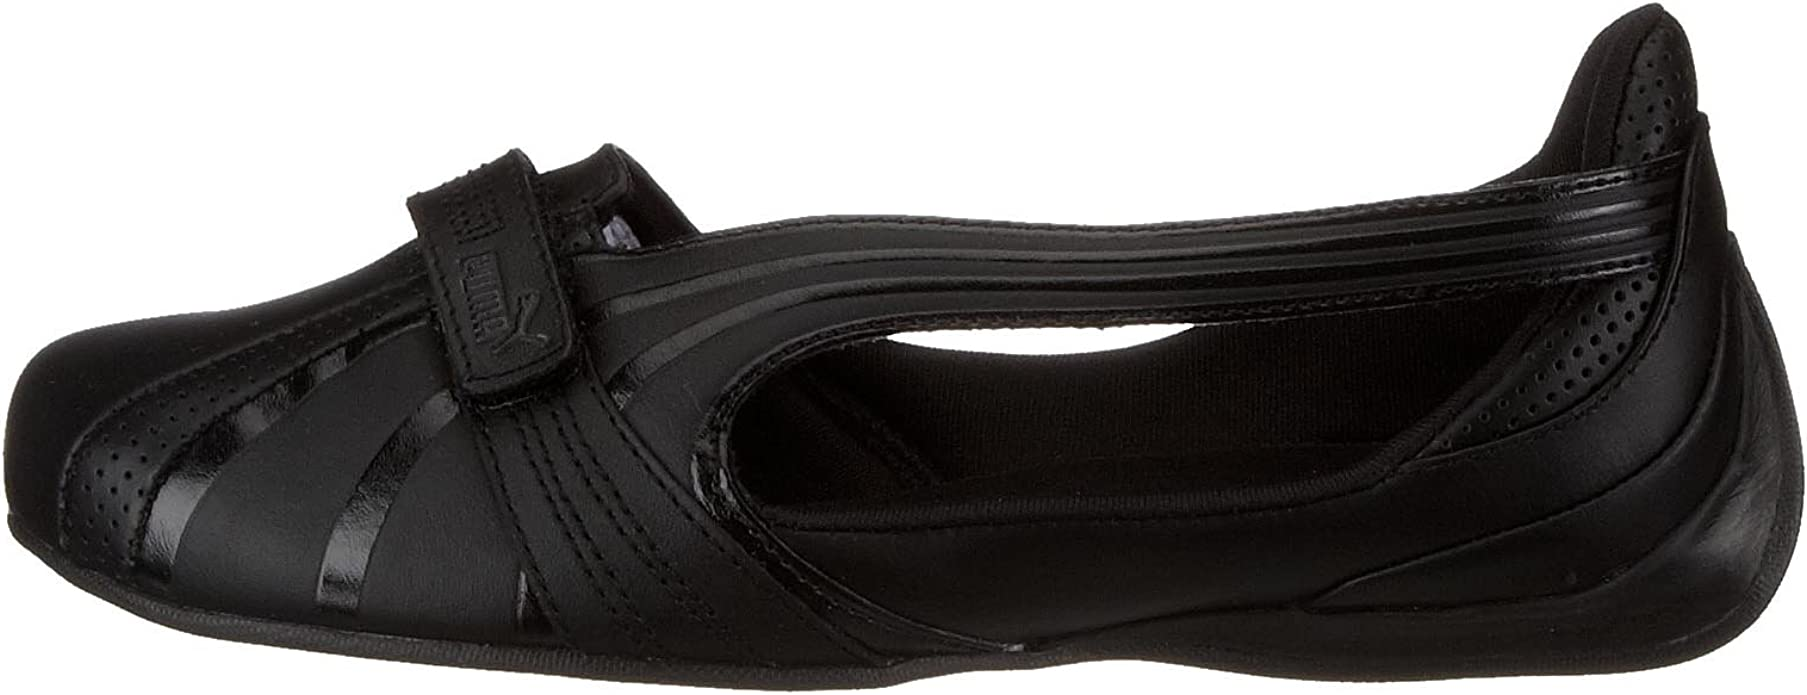 Puma Espera II 302885 01 schwarz, damen, preis, Größe